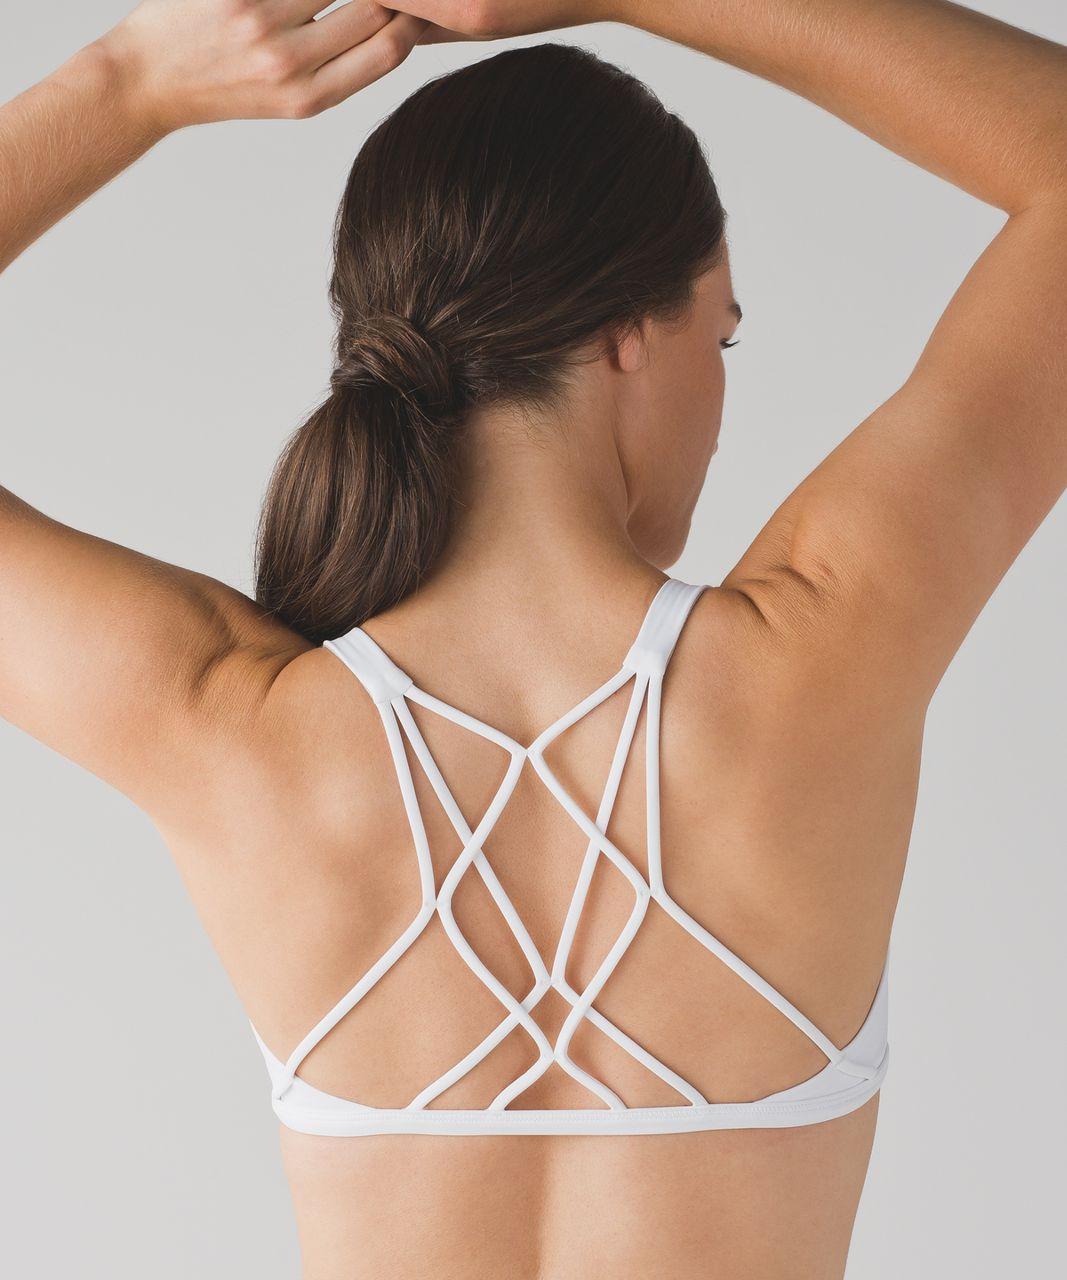 Lululemon Free To Be Zen Bra - White